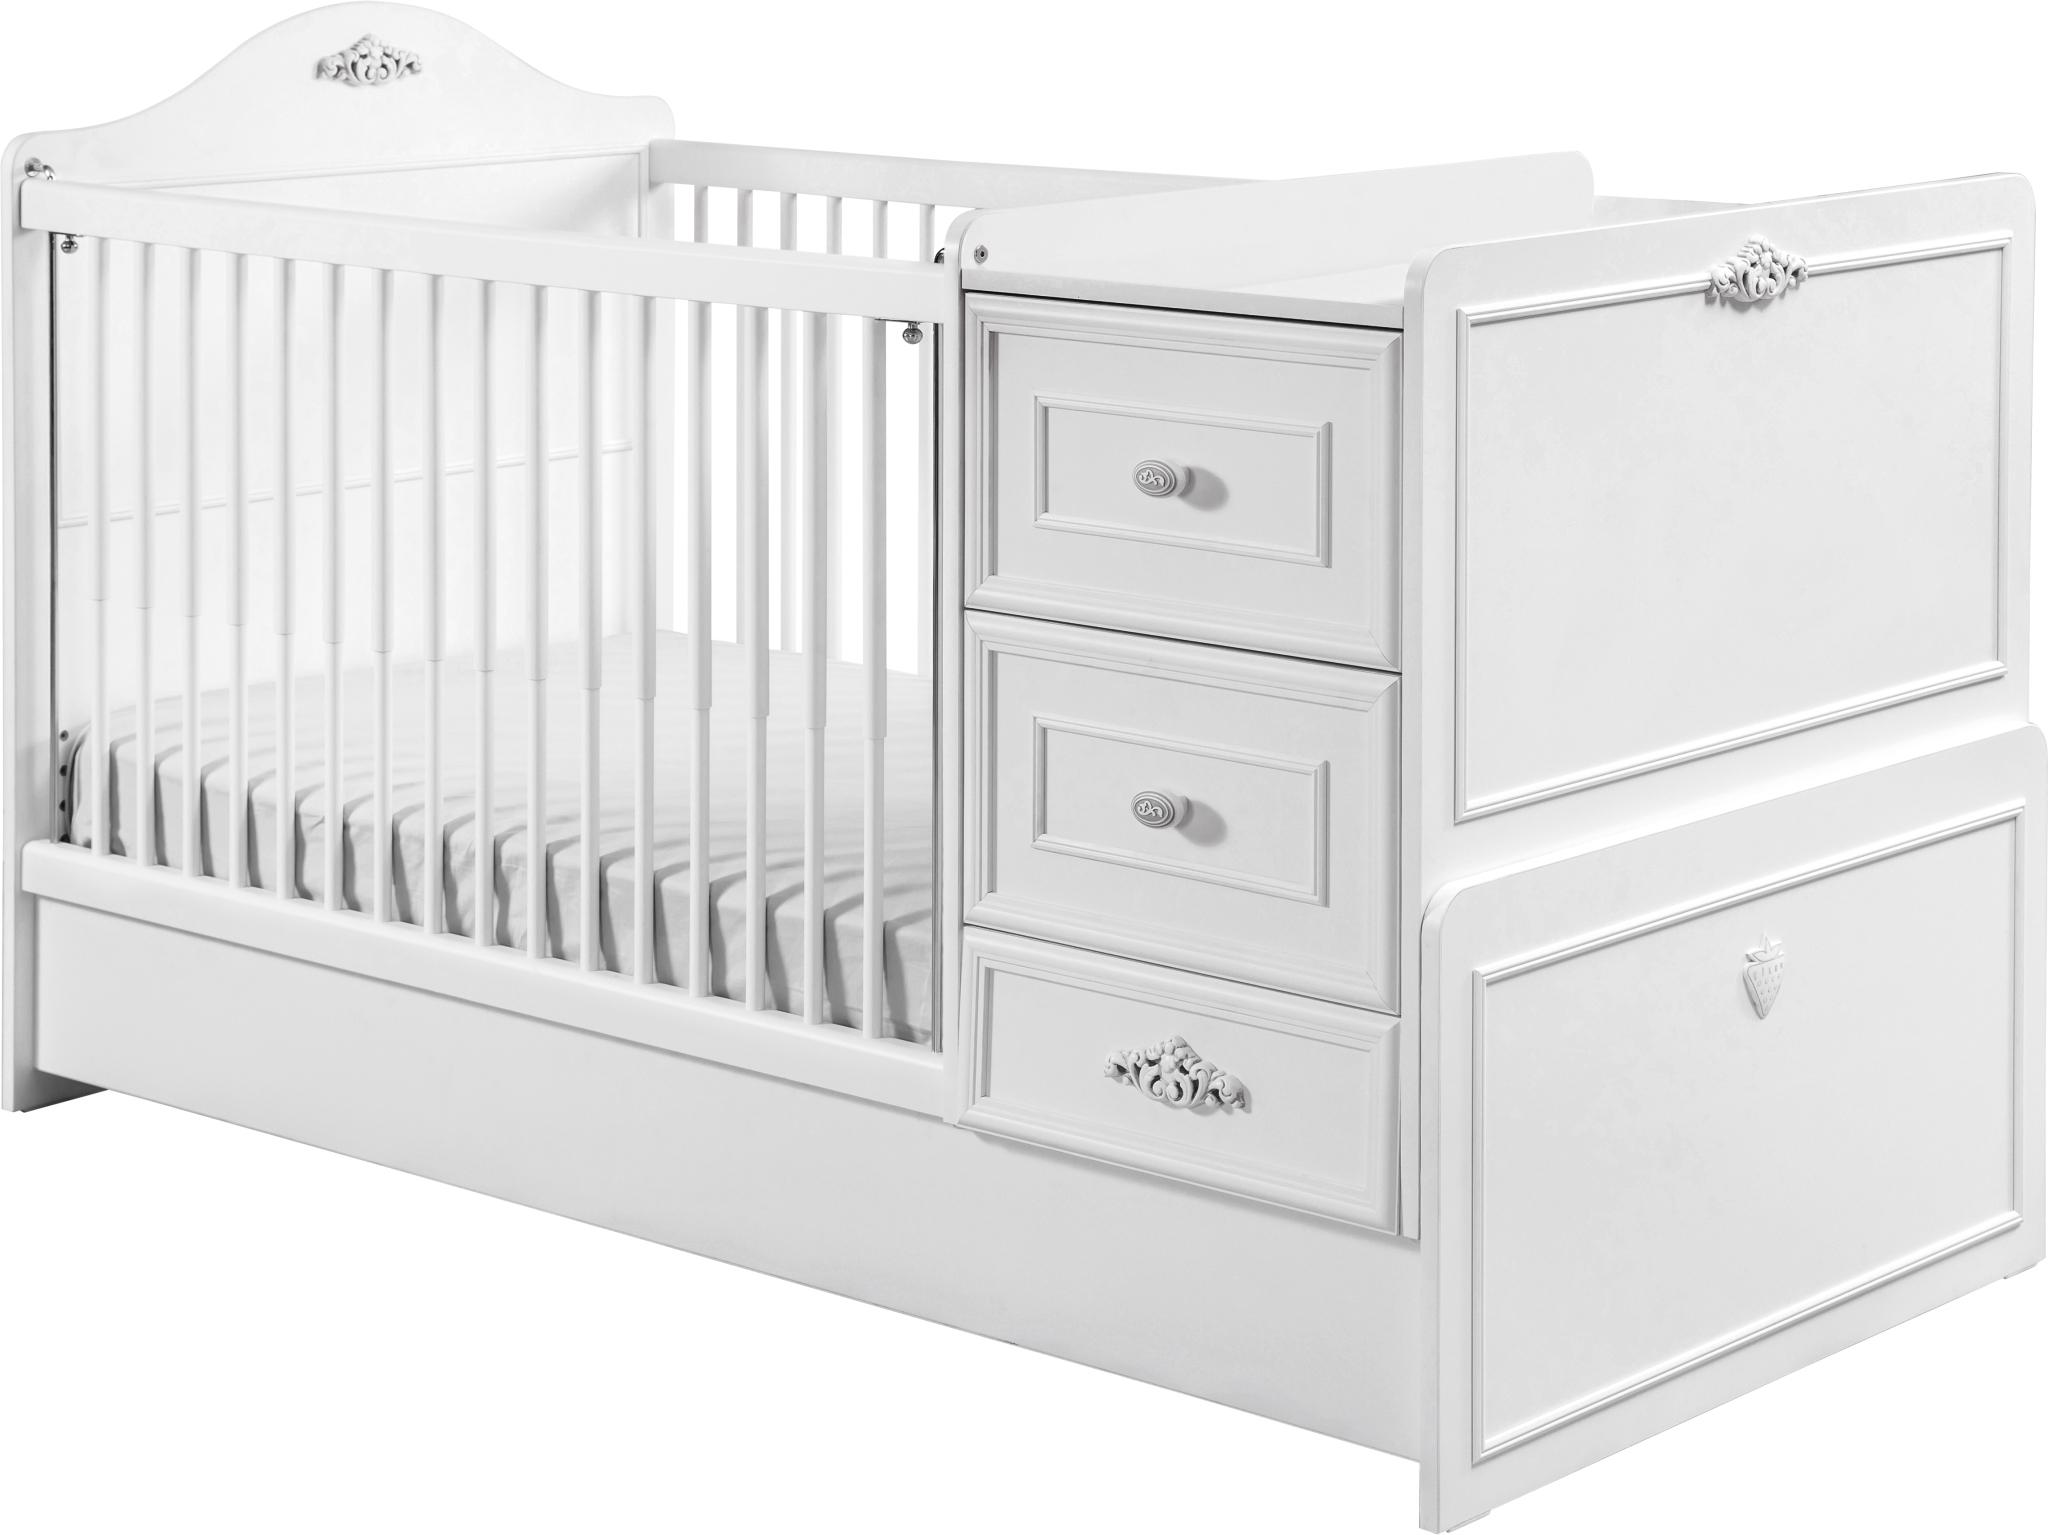 Patut transformabil din pal pentru bebe Romantic Baby White 160 x 75 cm